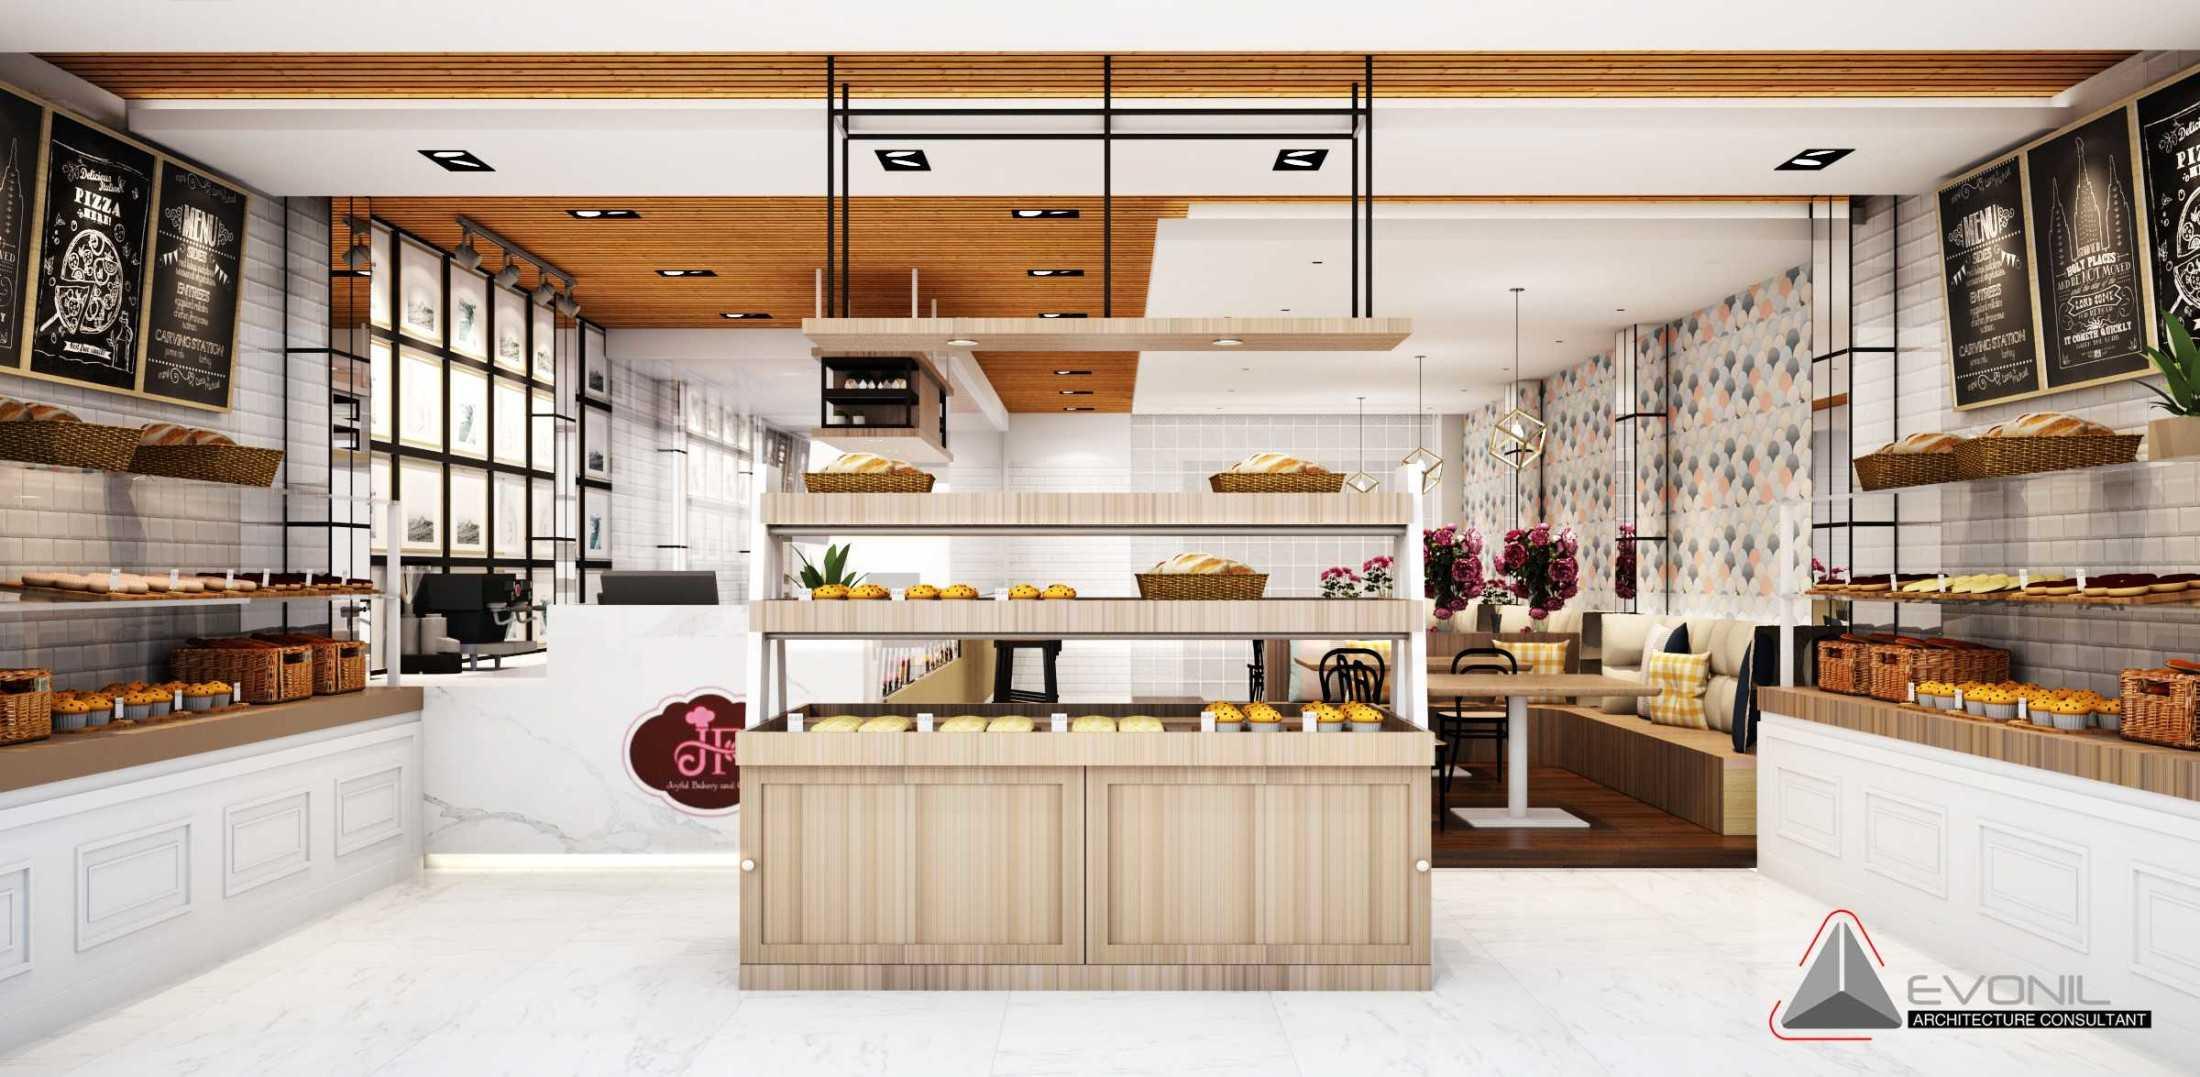 Evonil Architecture Joyful Bakery - Makassar Makassar, Kota Makassar, Sulawesi Selatan, Indonesia Makassar, Kota Makassar, Sulawesi Selatan, Indonesia Joyful Bakery - Makassar  - Evonil Architecture Modern 77971